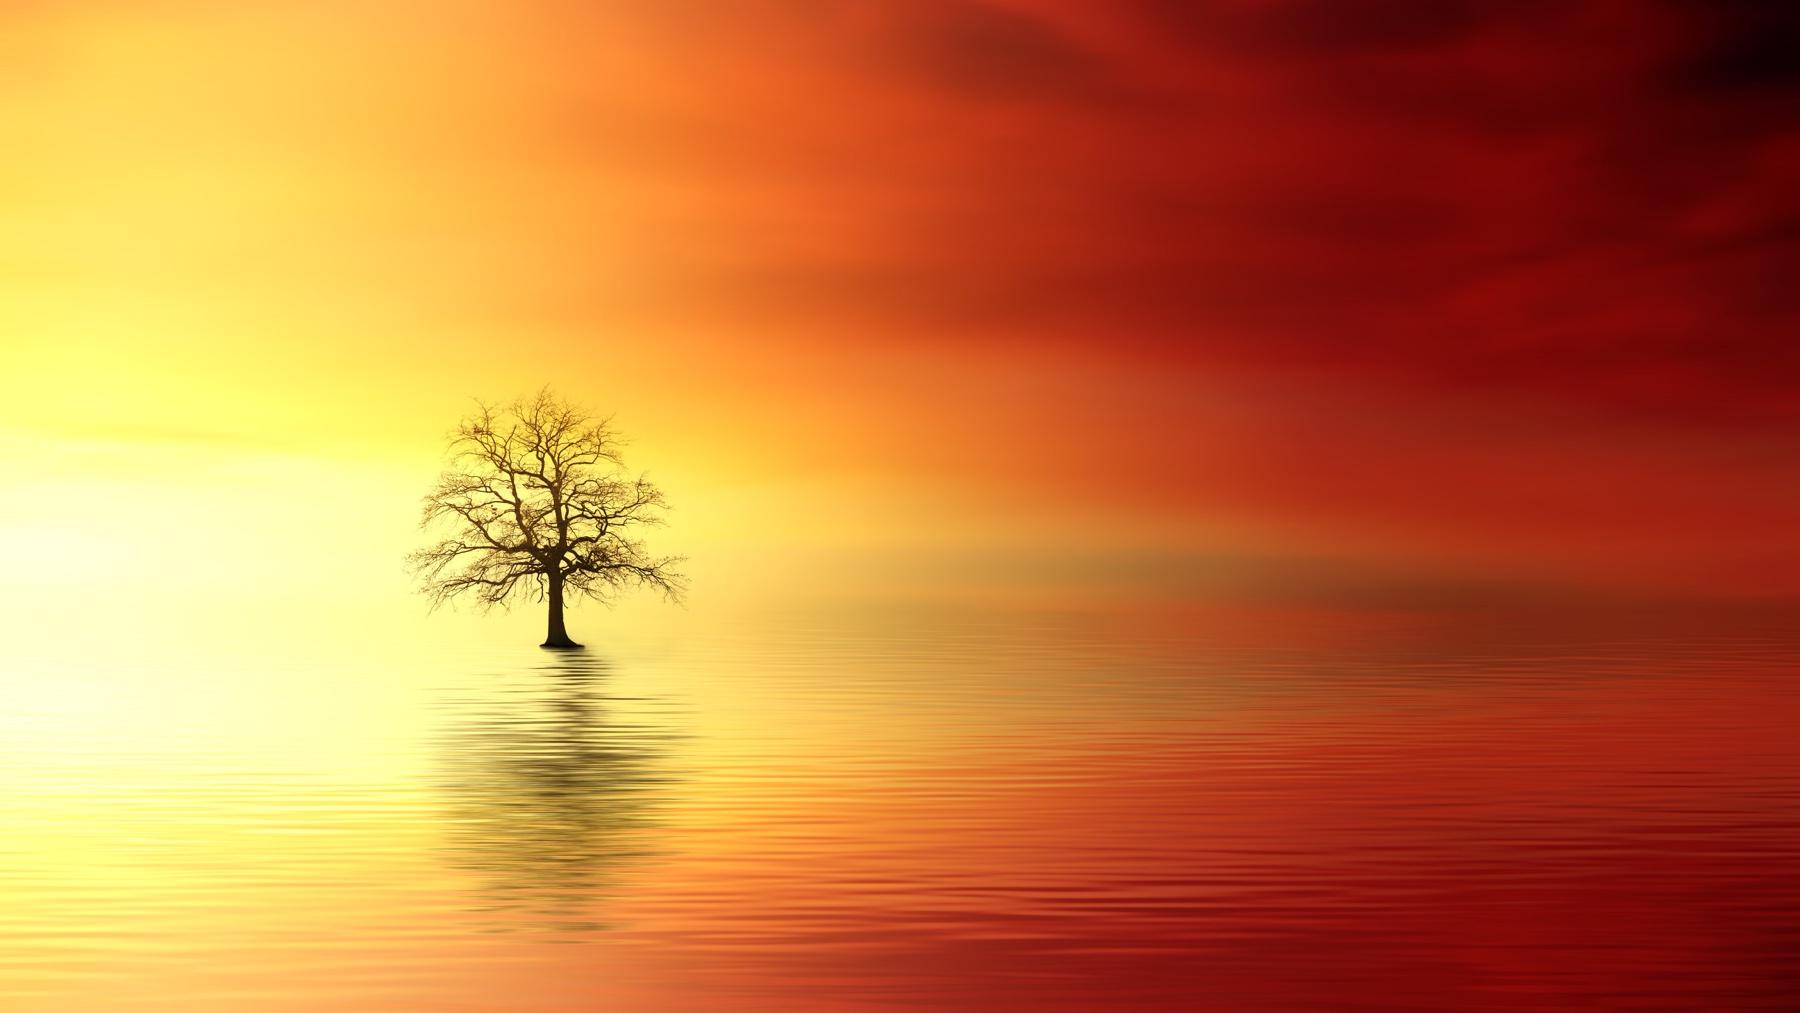 sunset-3156440